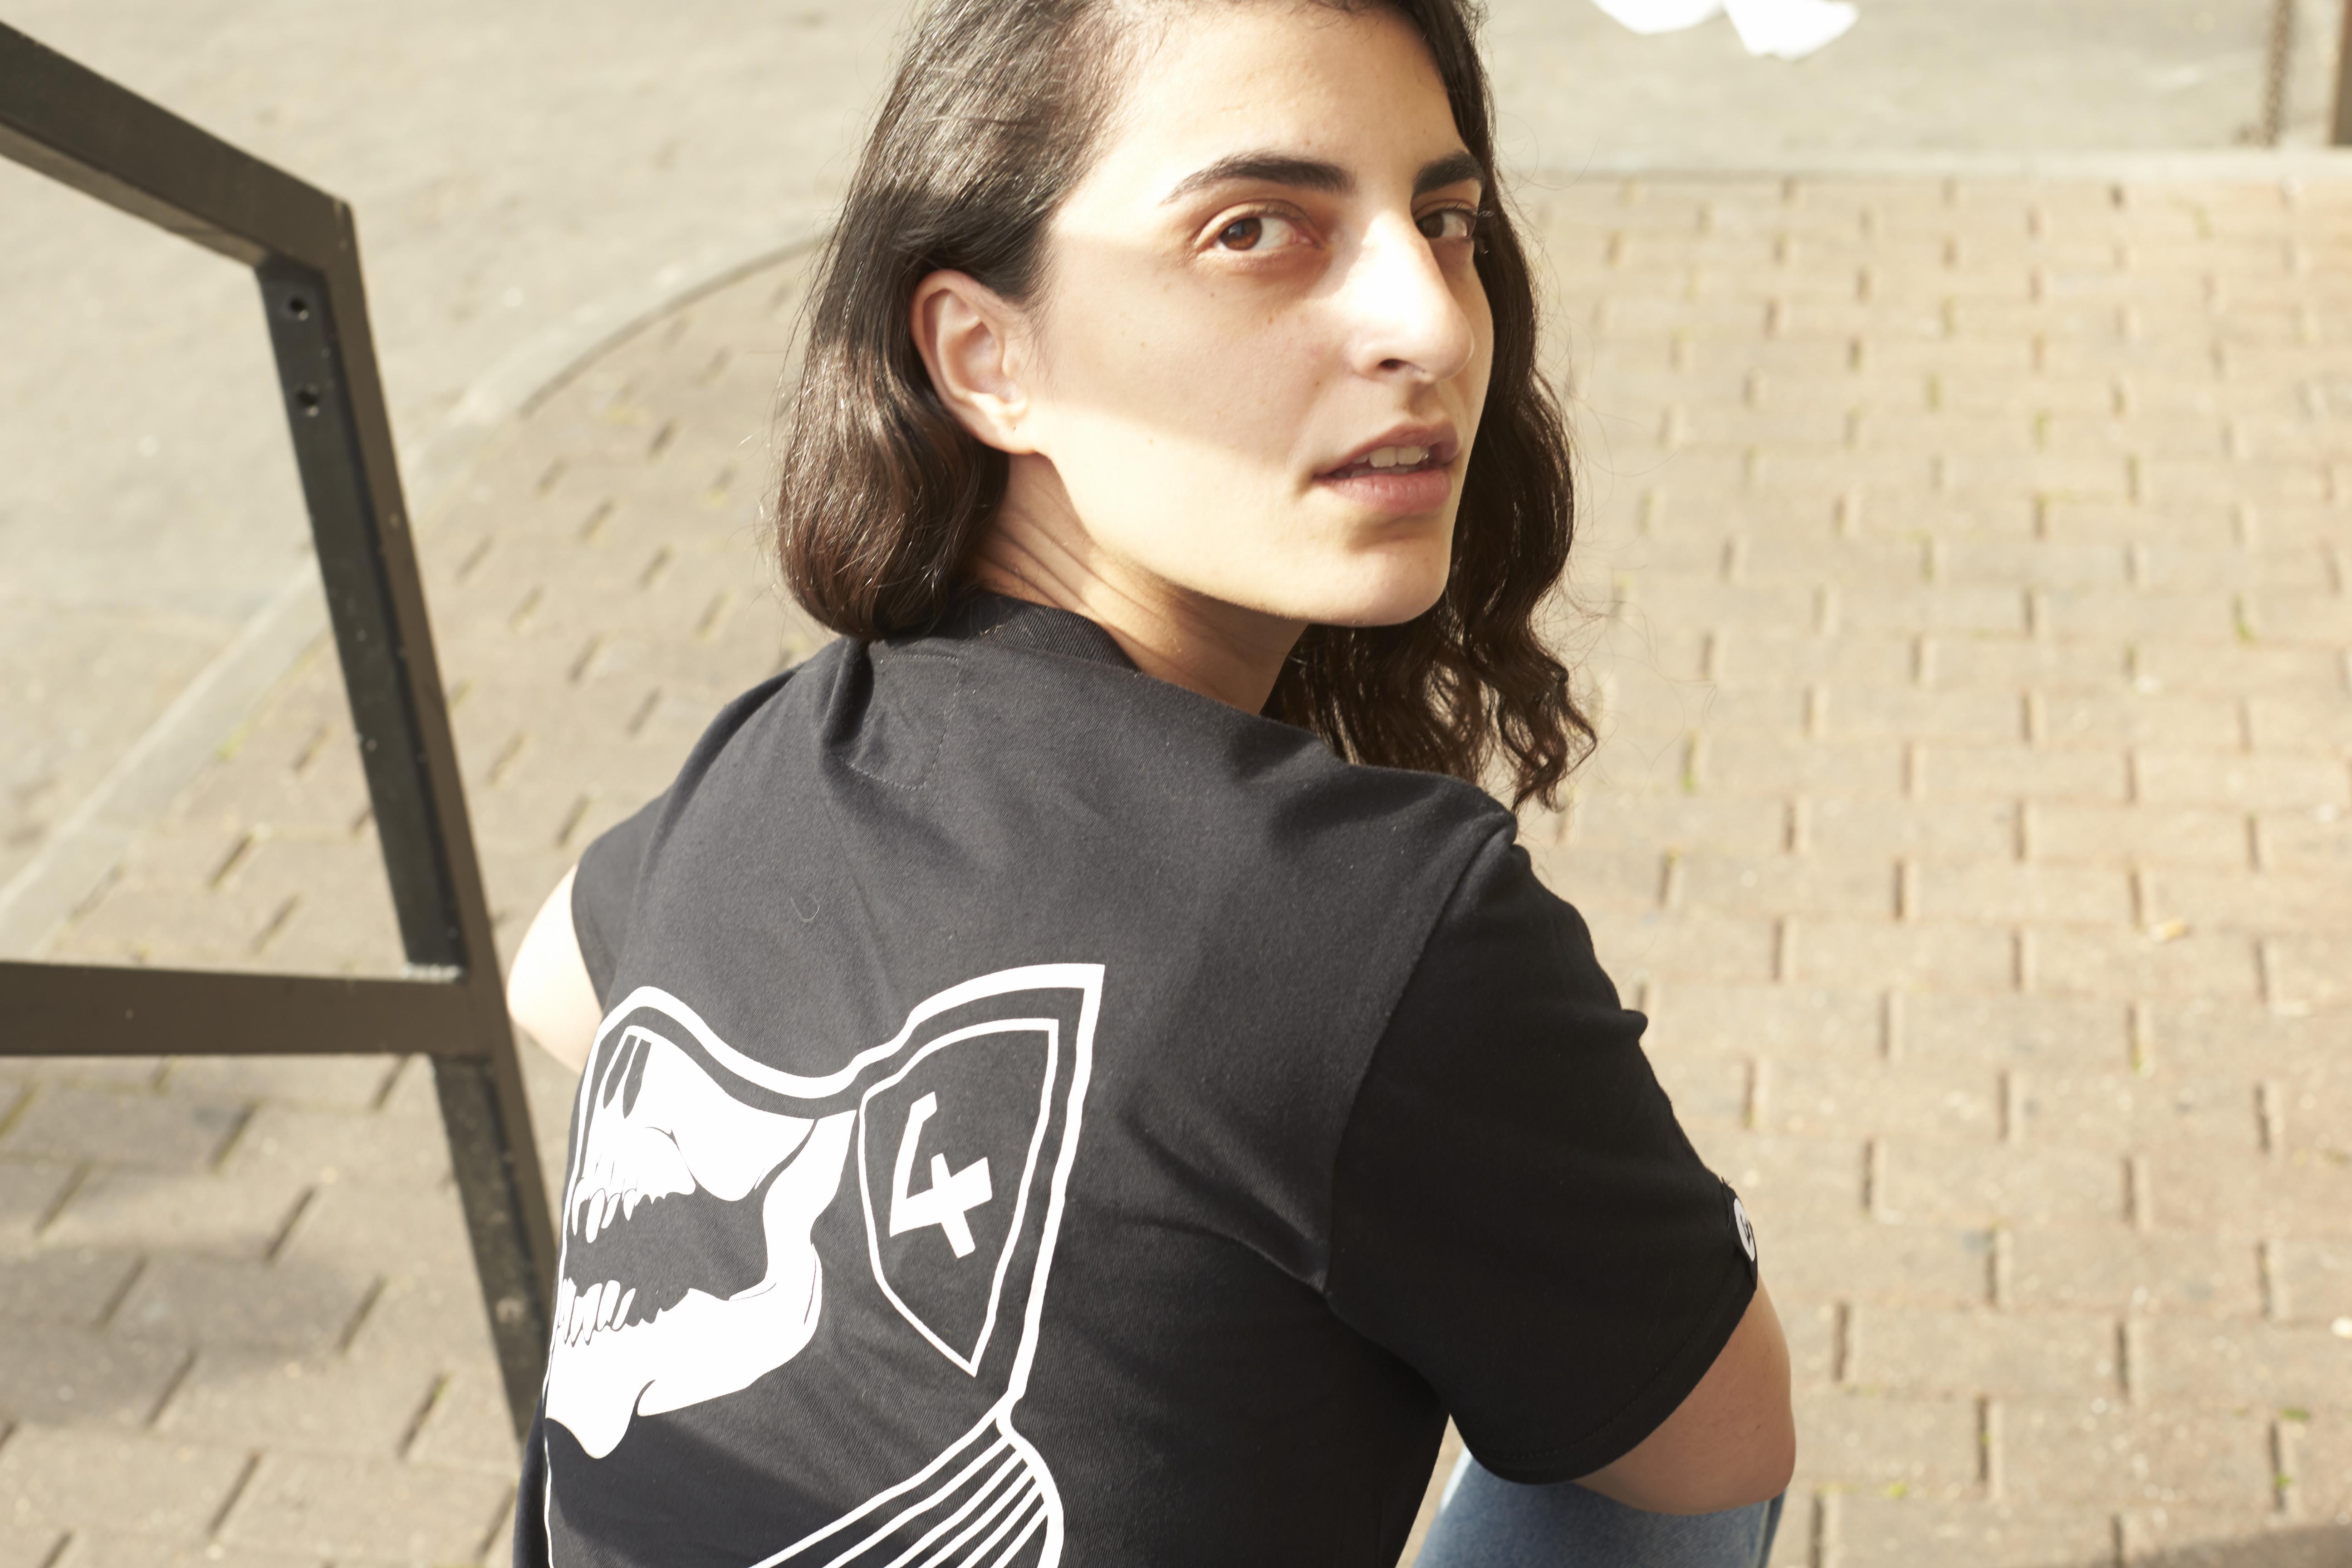 4BYSIX_Mission_T_Shirt_alex_dawber